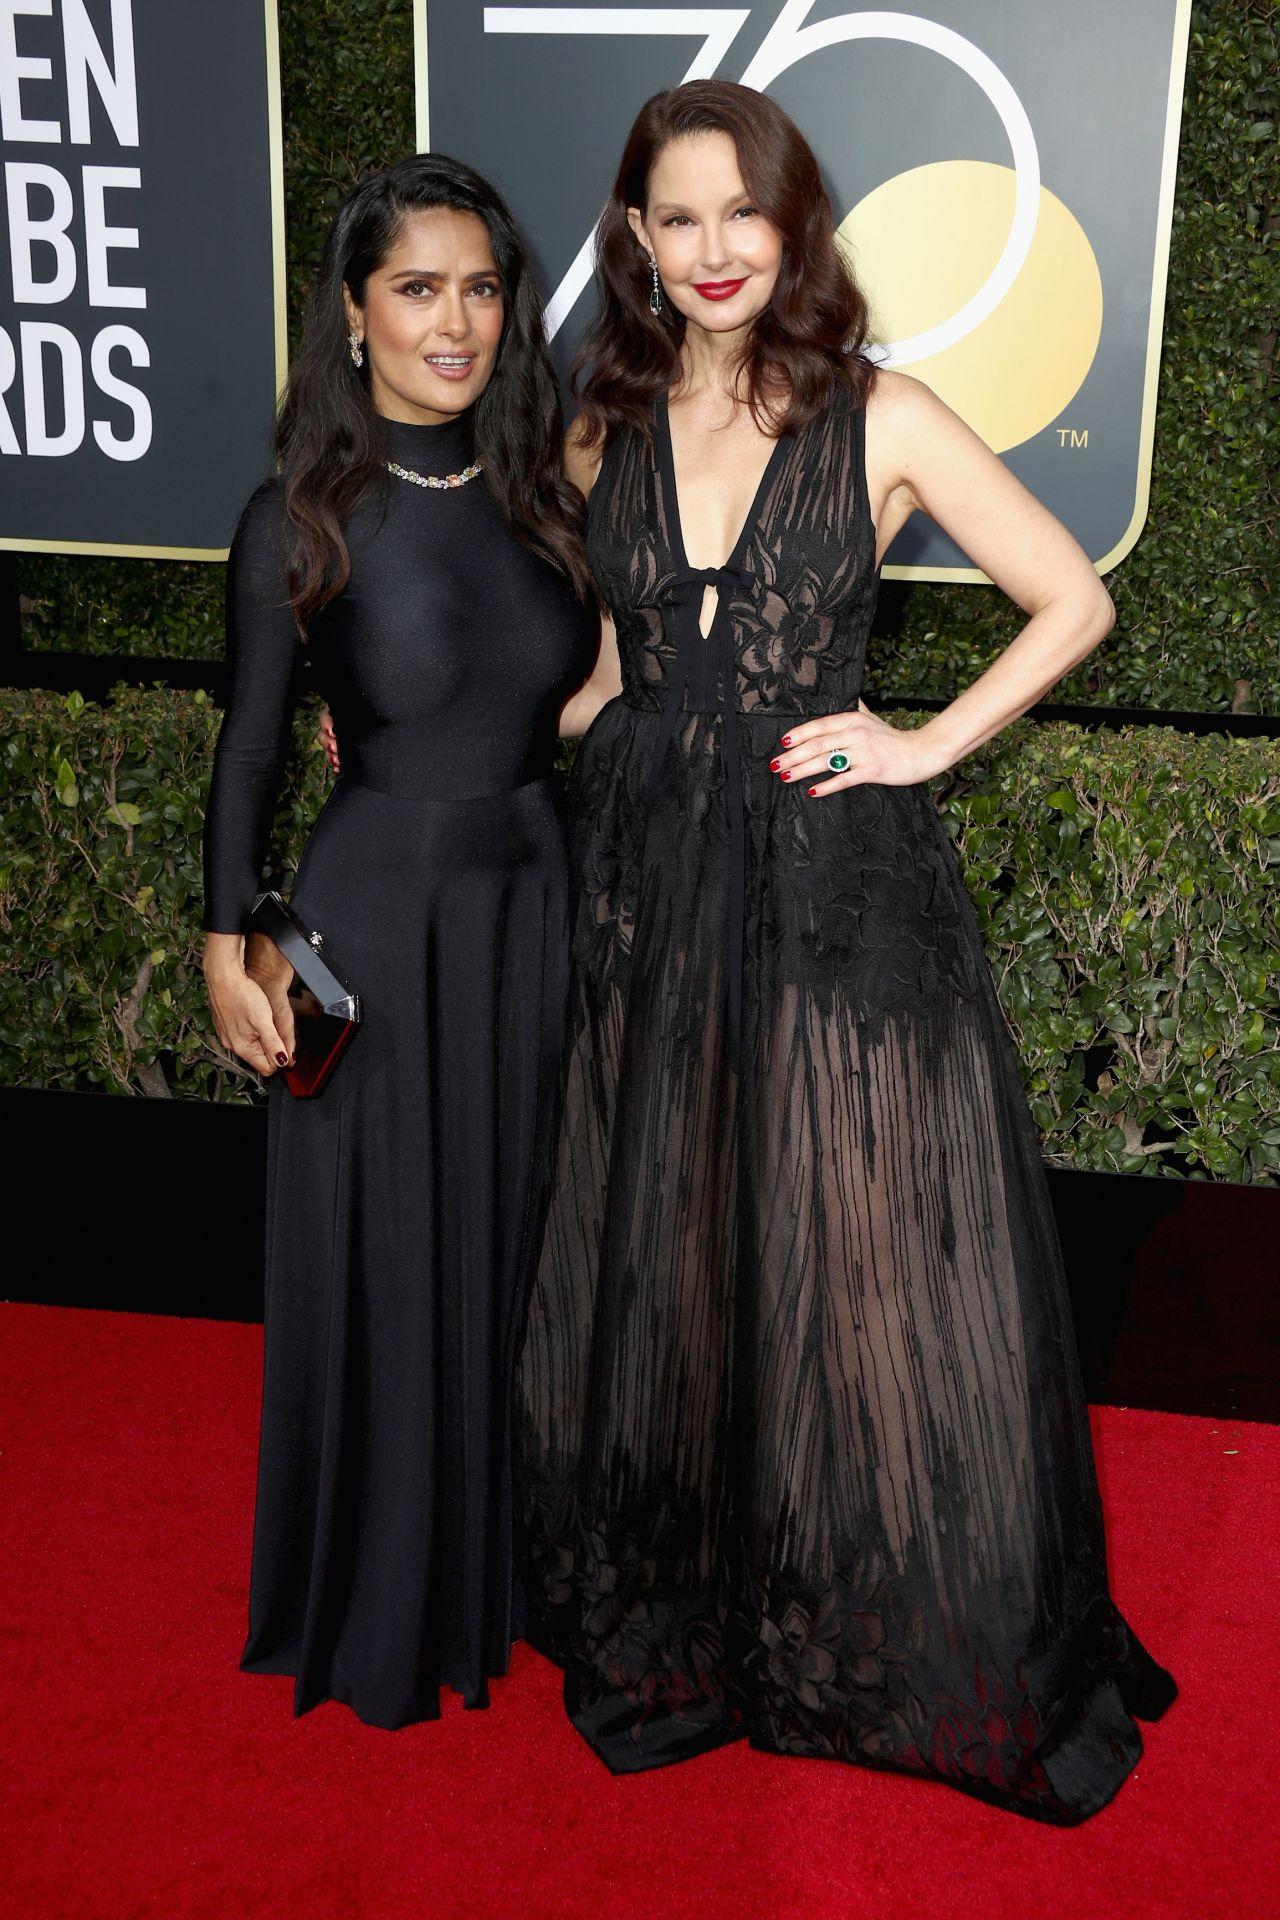 http://celebmafia.com/wp-content/uploads/2018/01/salma-hayek-golden-globe-awards-2018-4.jpg